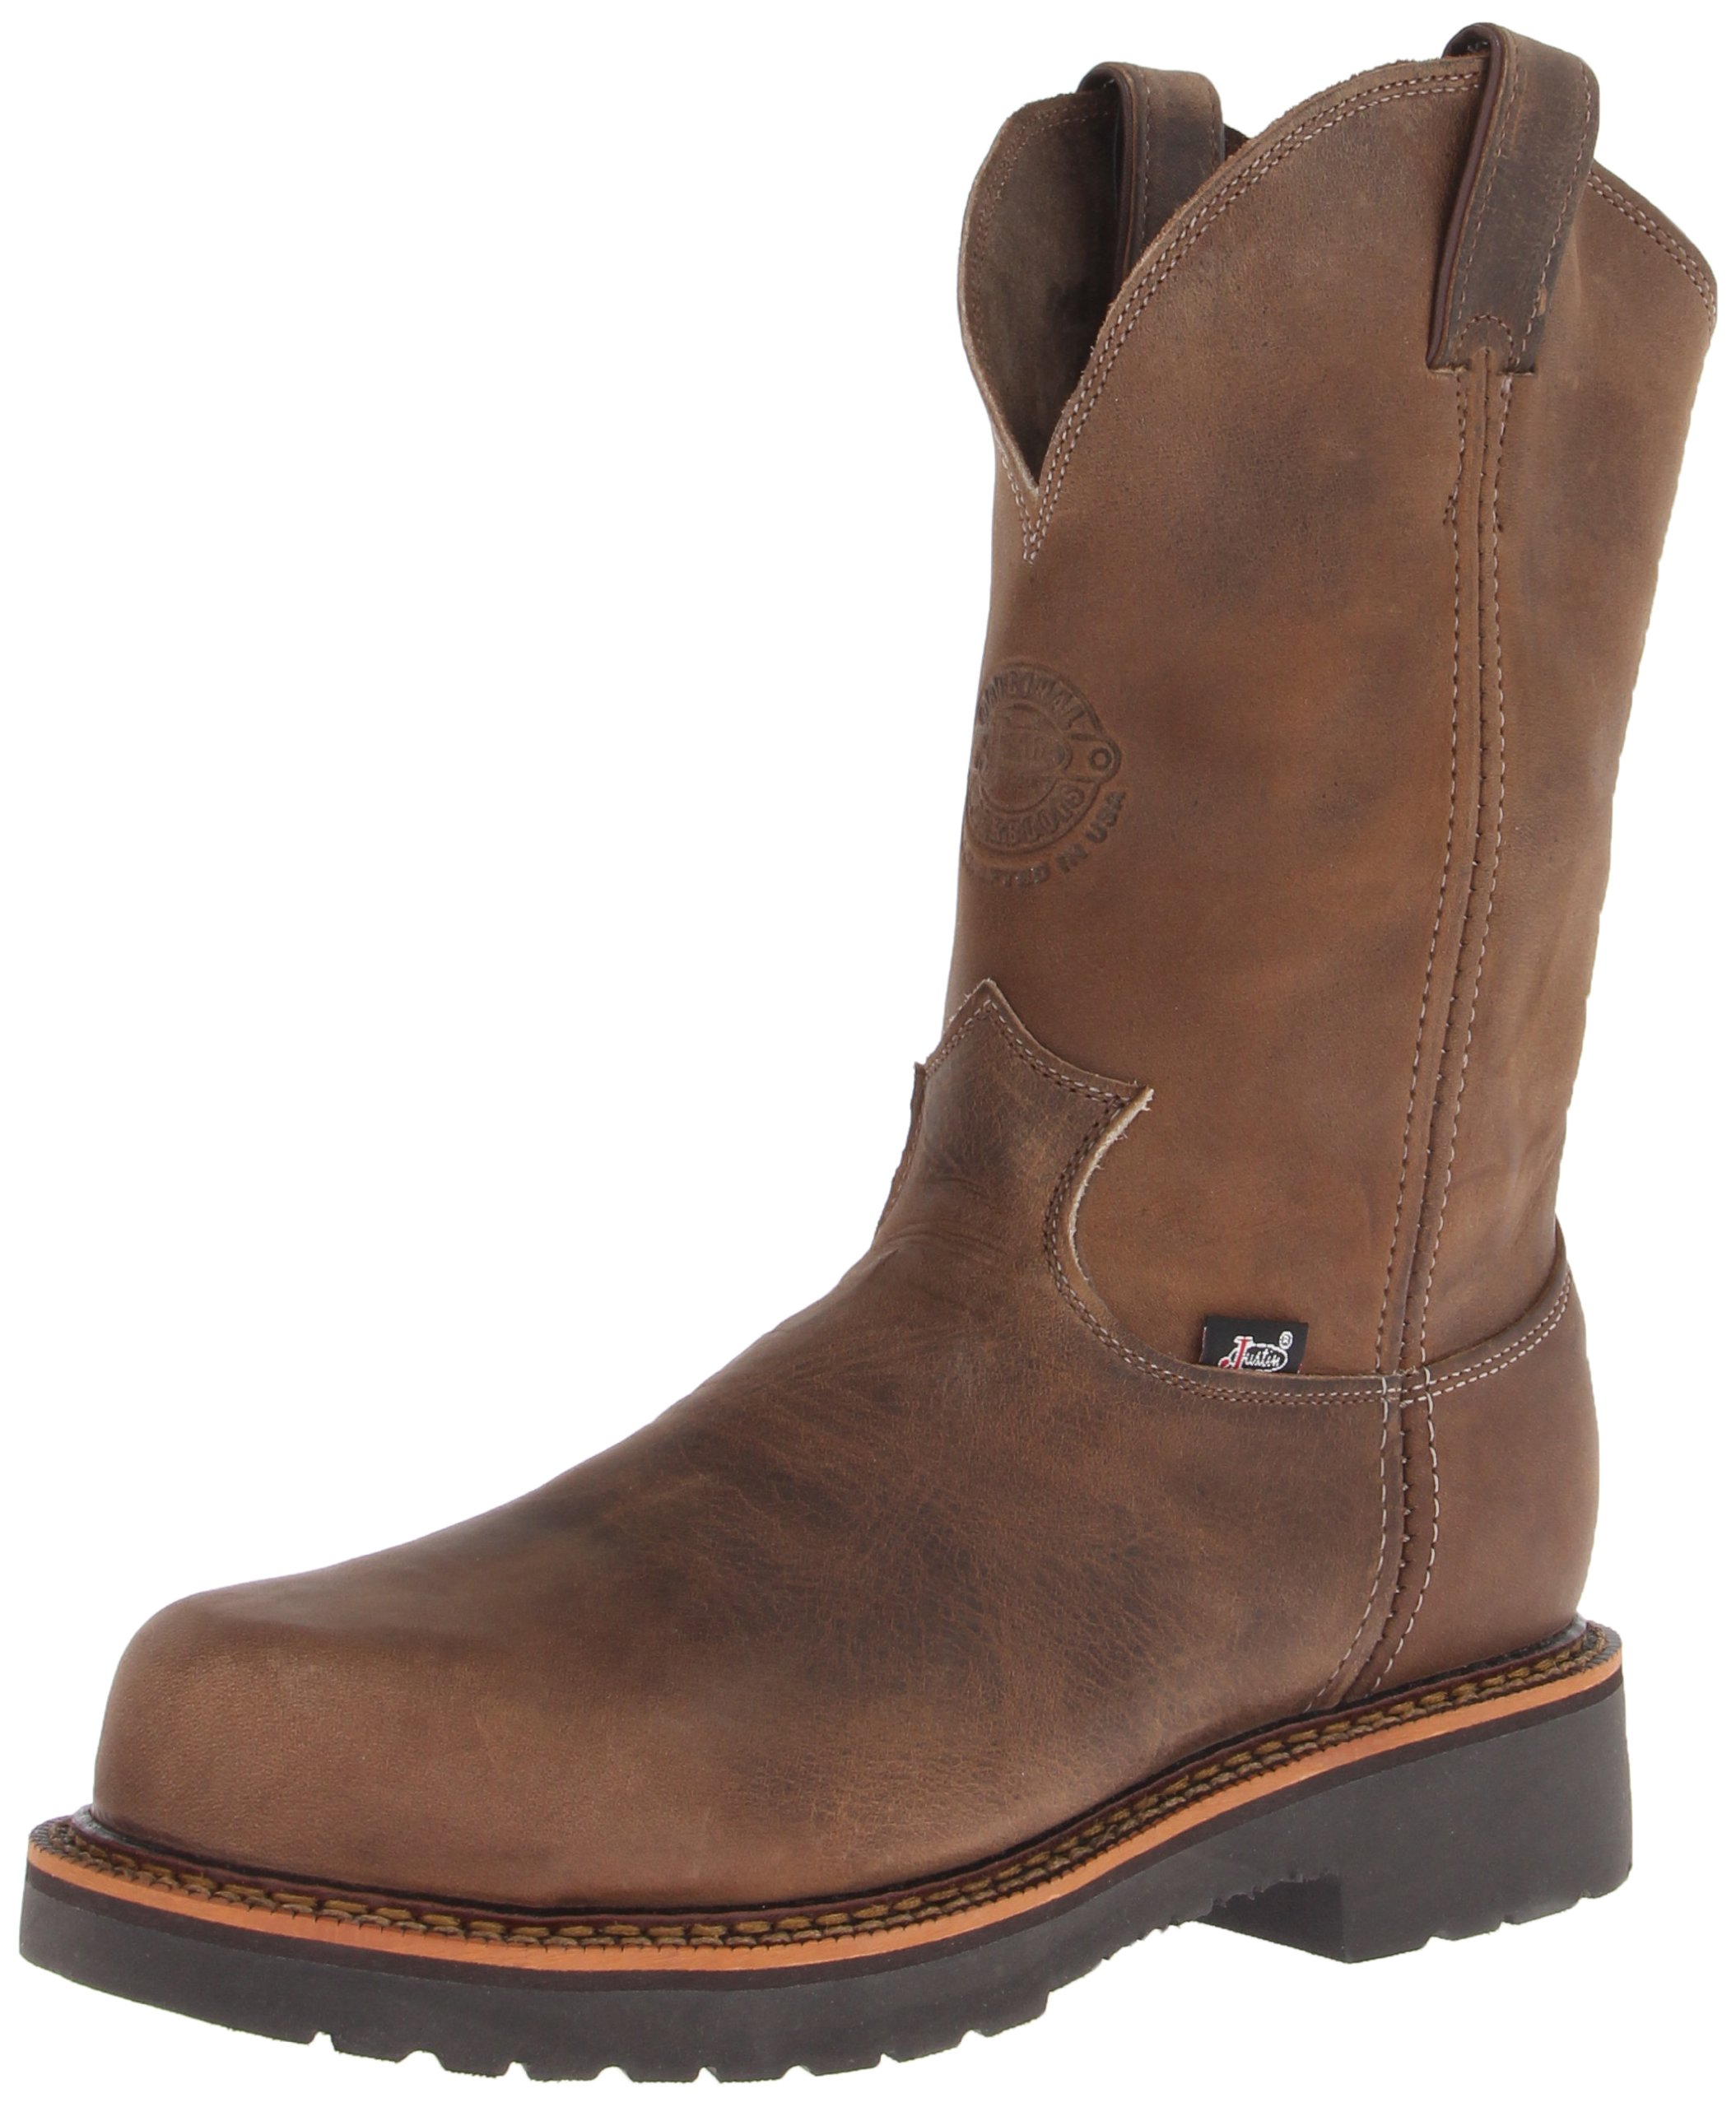 Justin Original Work Boots Men's Jmax PN Comp Toe Composite Work Boot,Tan/Crazy Horse,12 EE US by Justin Original Work